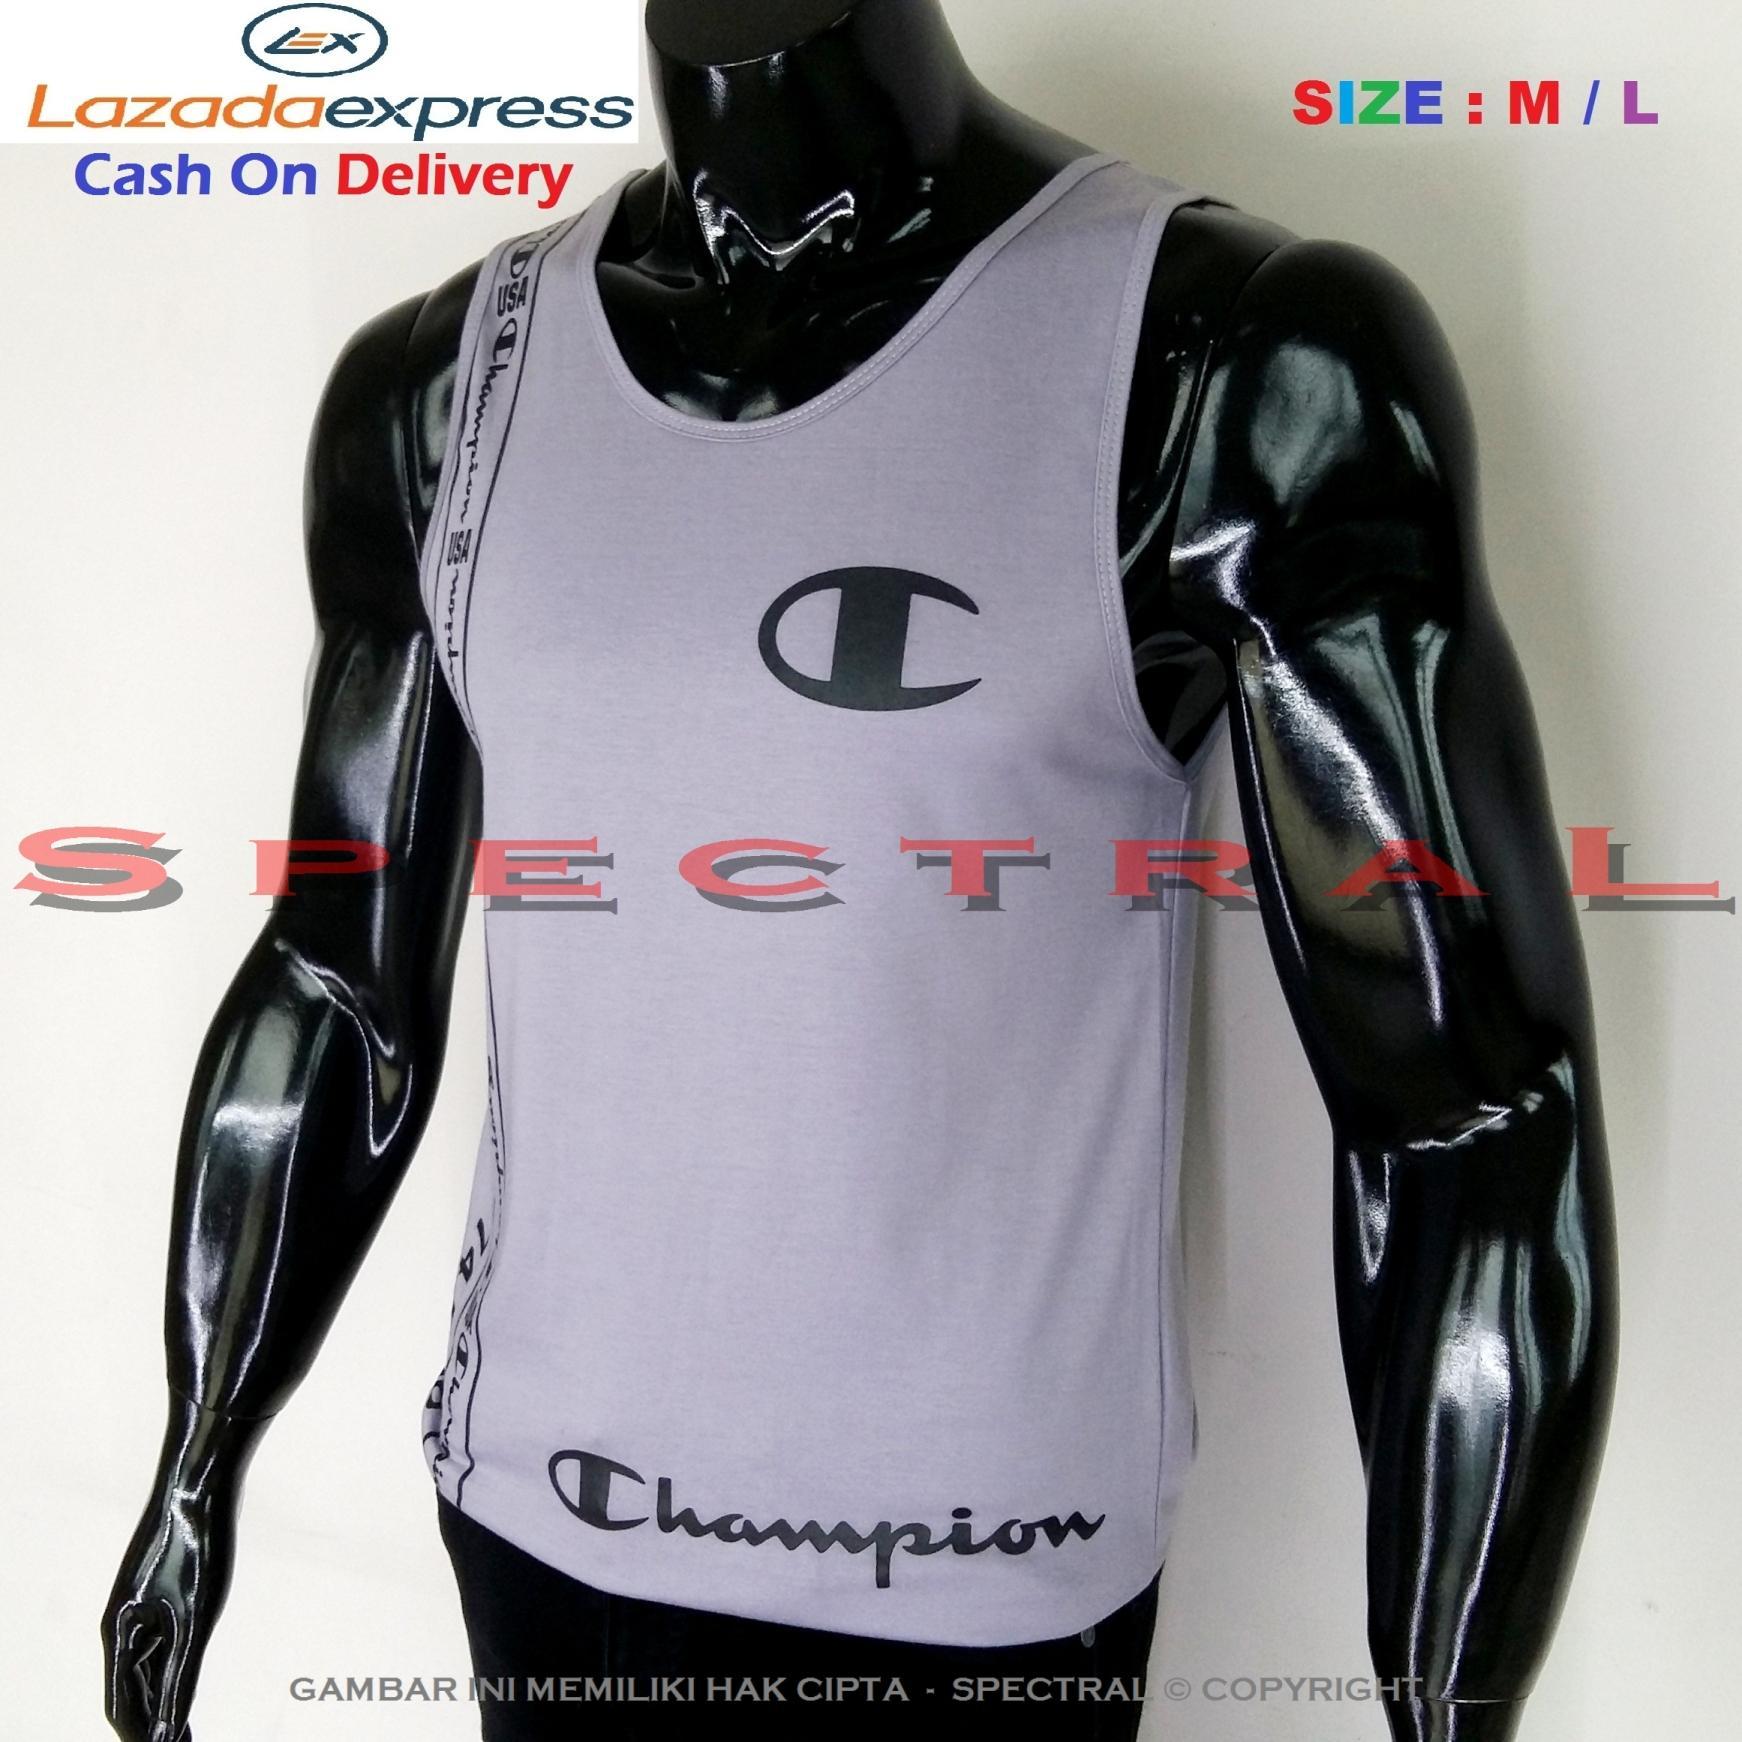 Spectral – Singlet Champion M / L Soft Cotton Combed 30s Abu